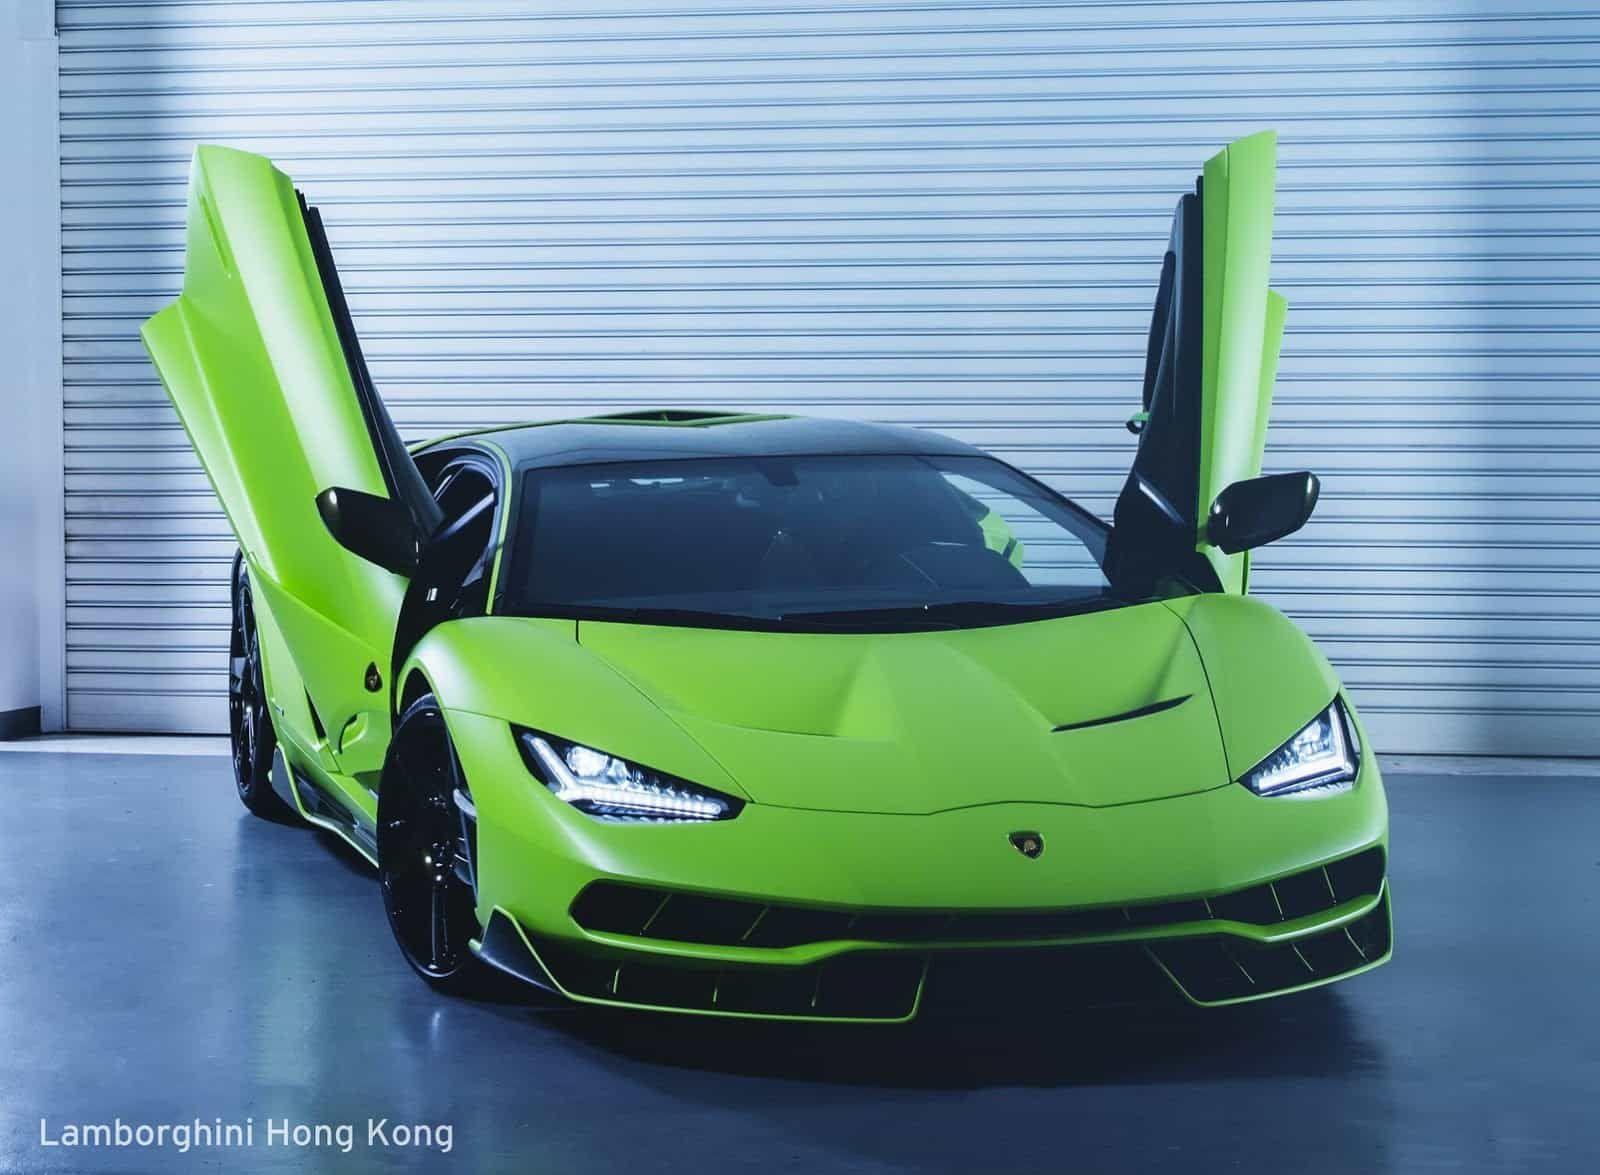 Verde Bronte Lamborghini Centenario Takes Your Breath Away Lamborghini Centenario Lamborghini Car Photos